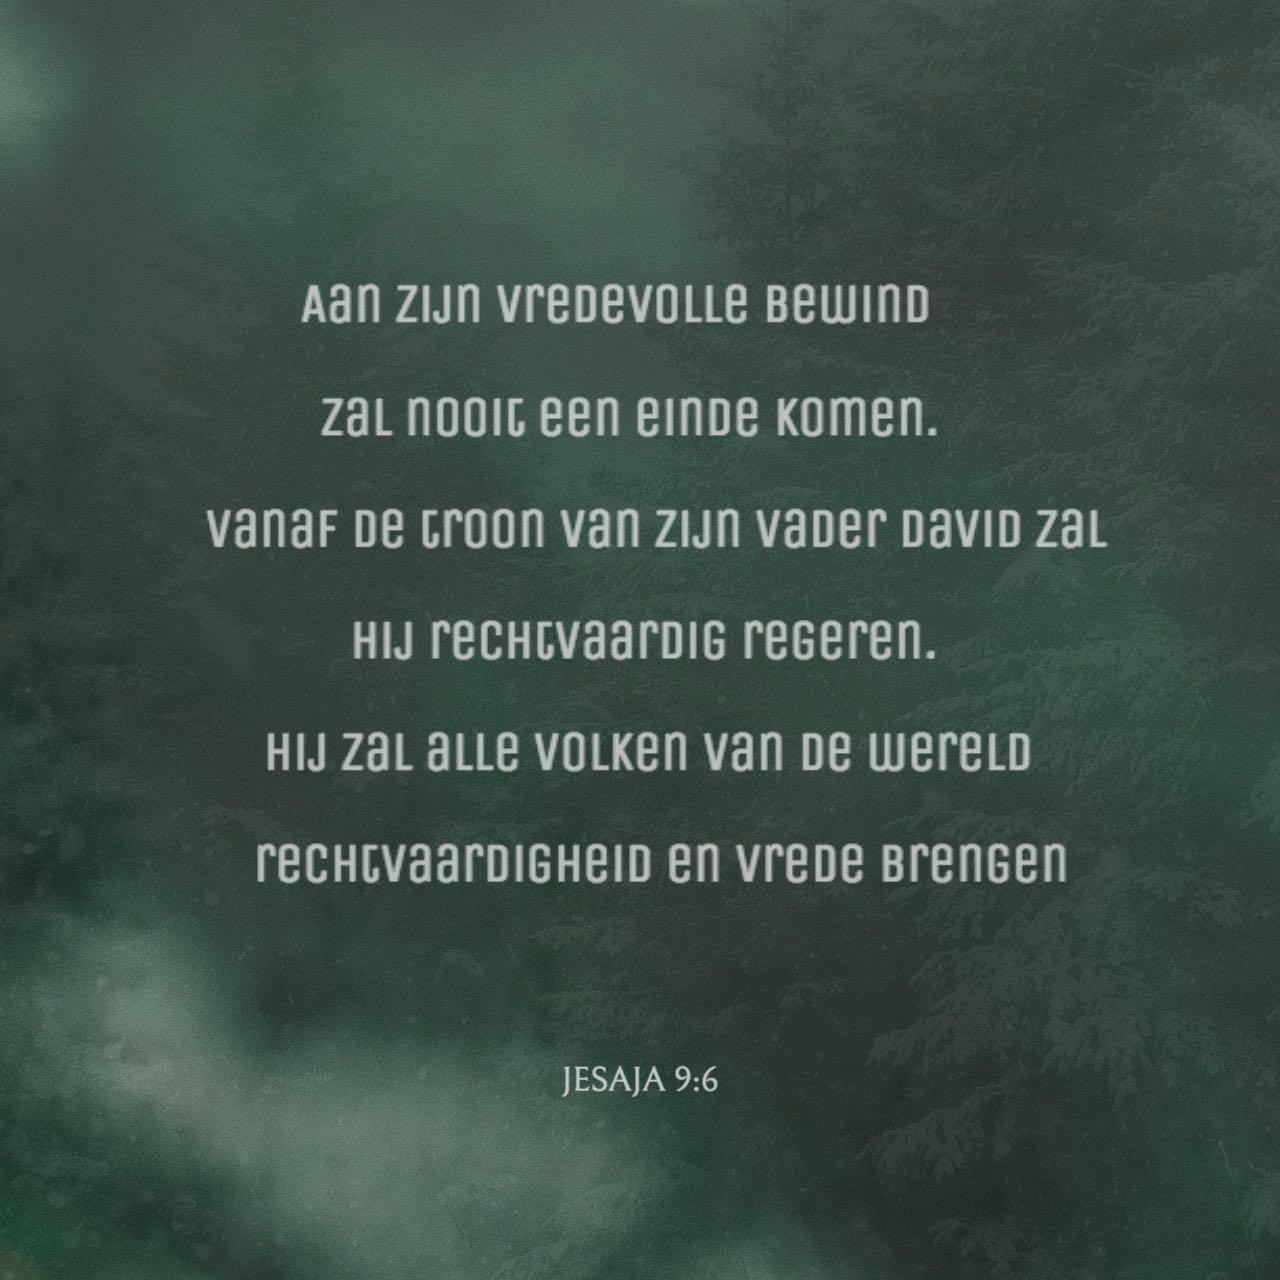 Versafbeelding Jesaja 9:6